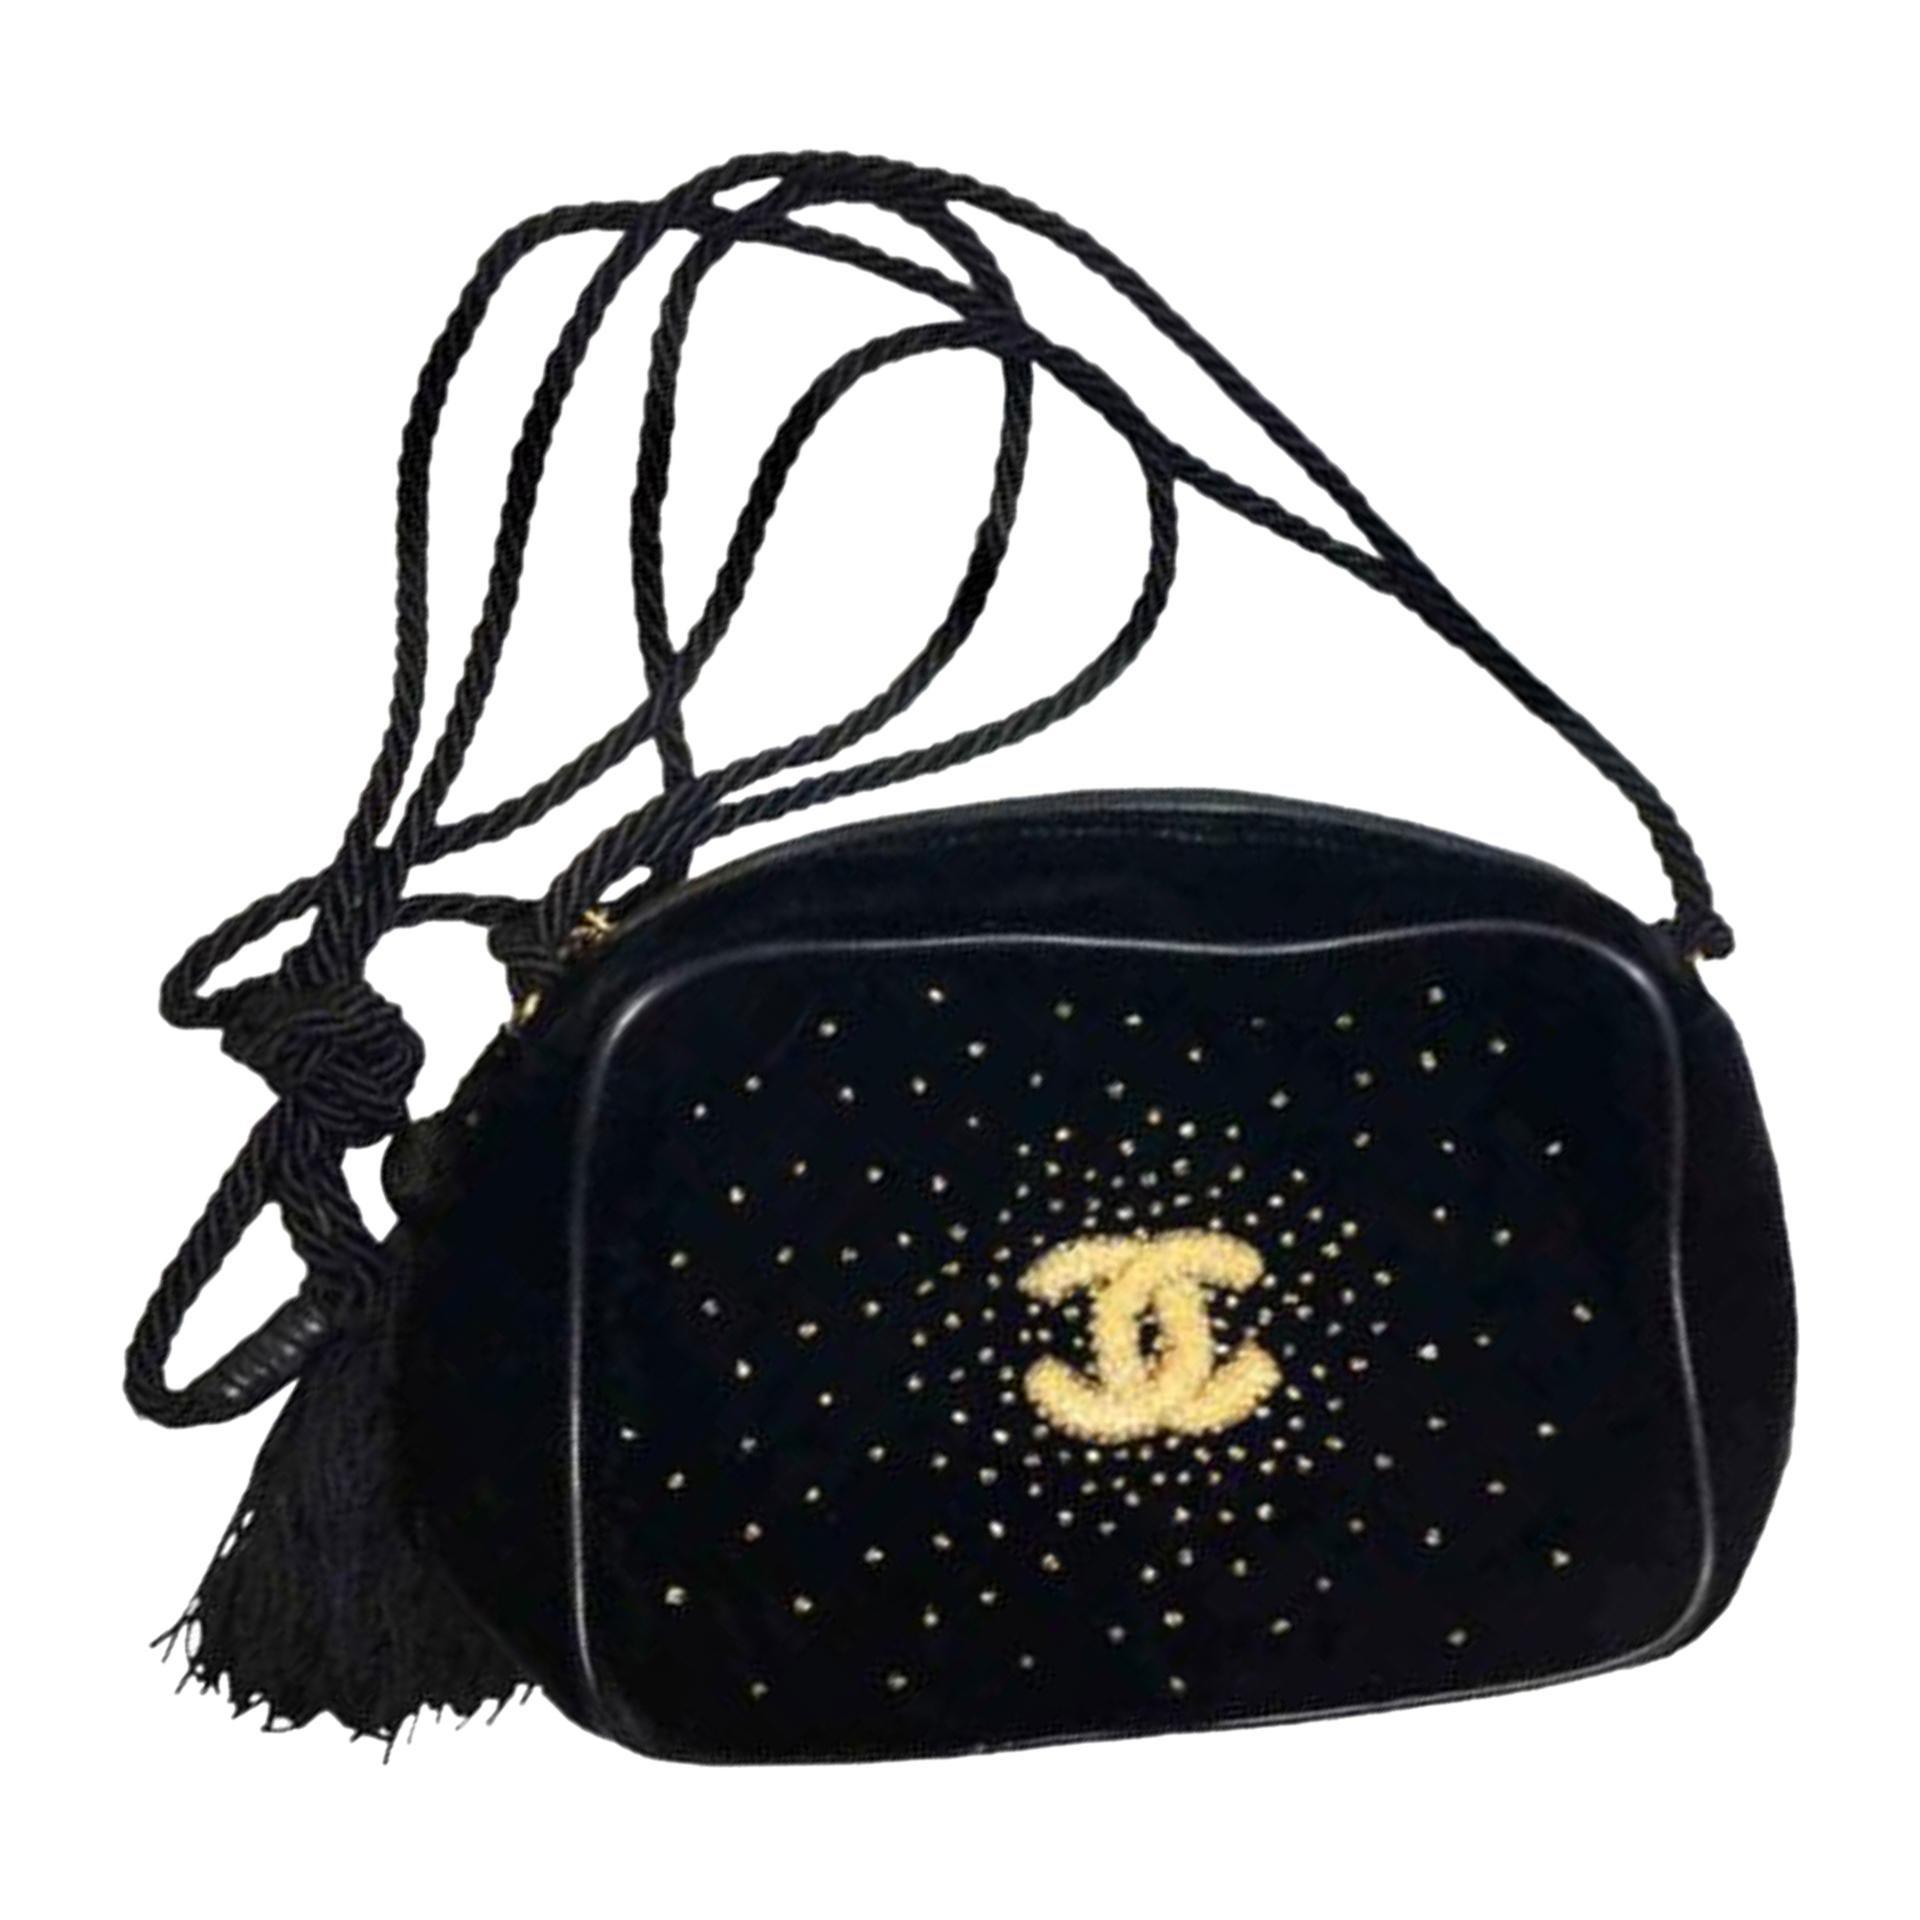 Chanel Timeless Tote Ultra Rare 1989 Mini Vintage Fringe Beaded Tassel Black Bag